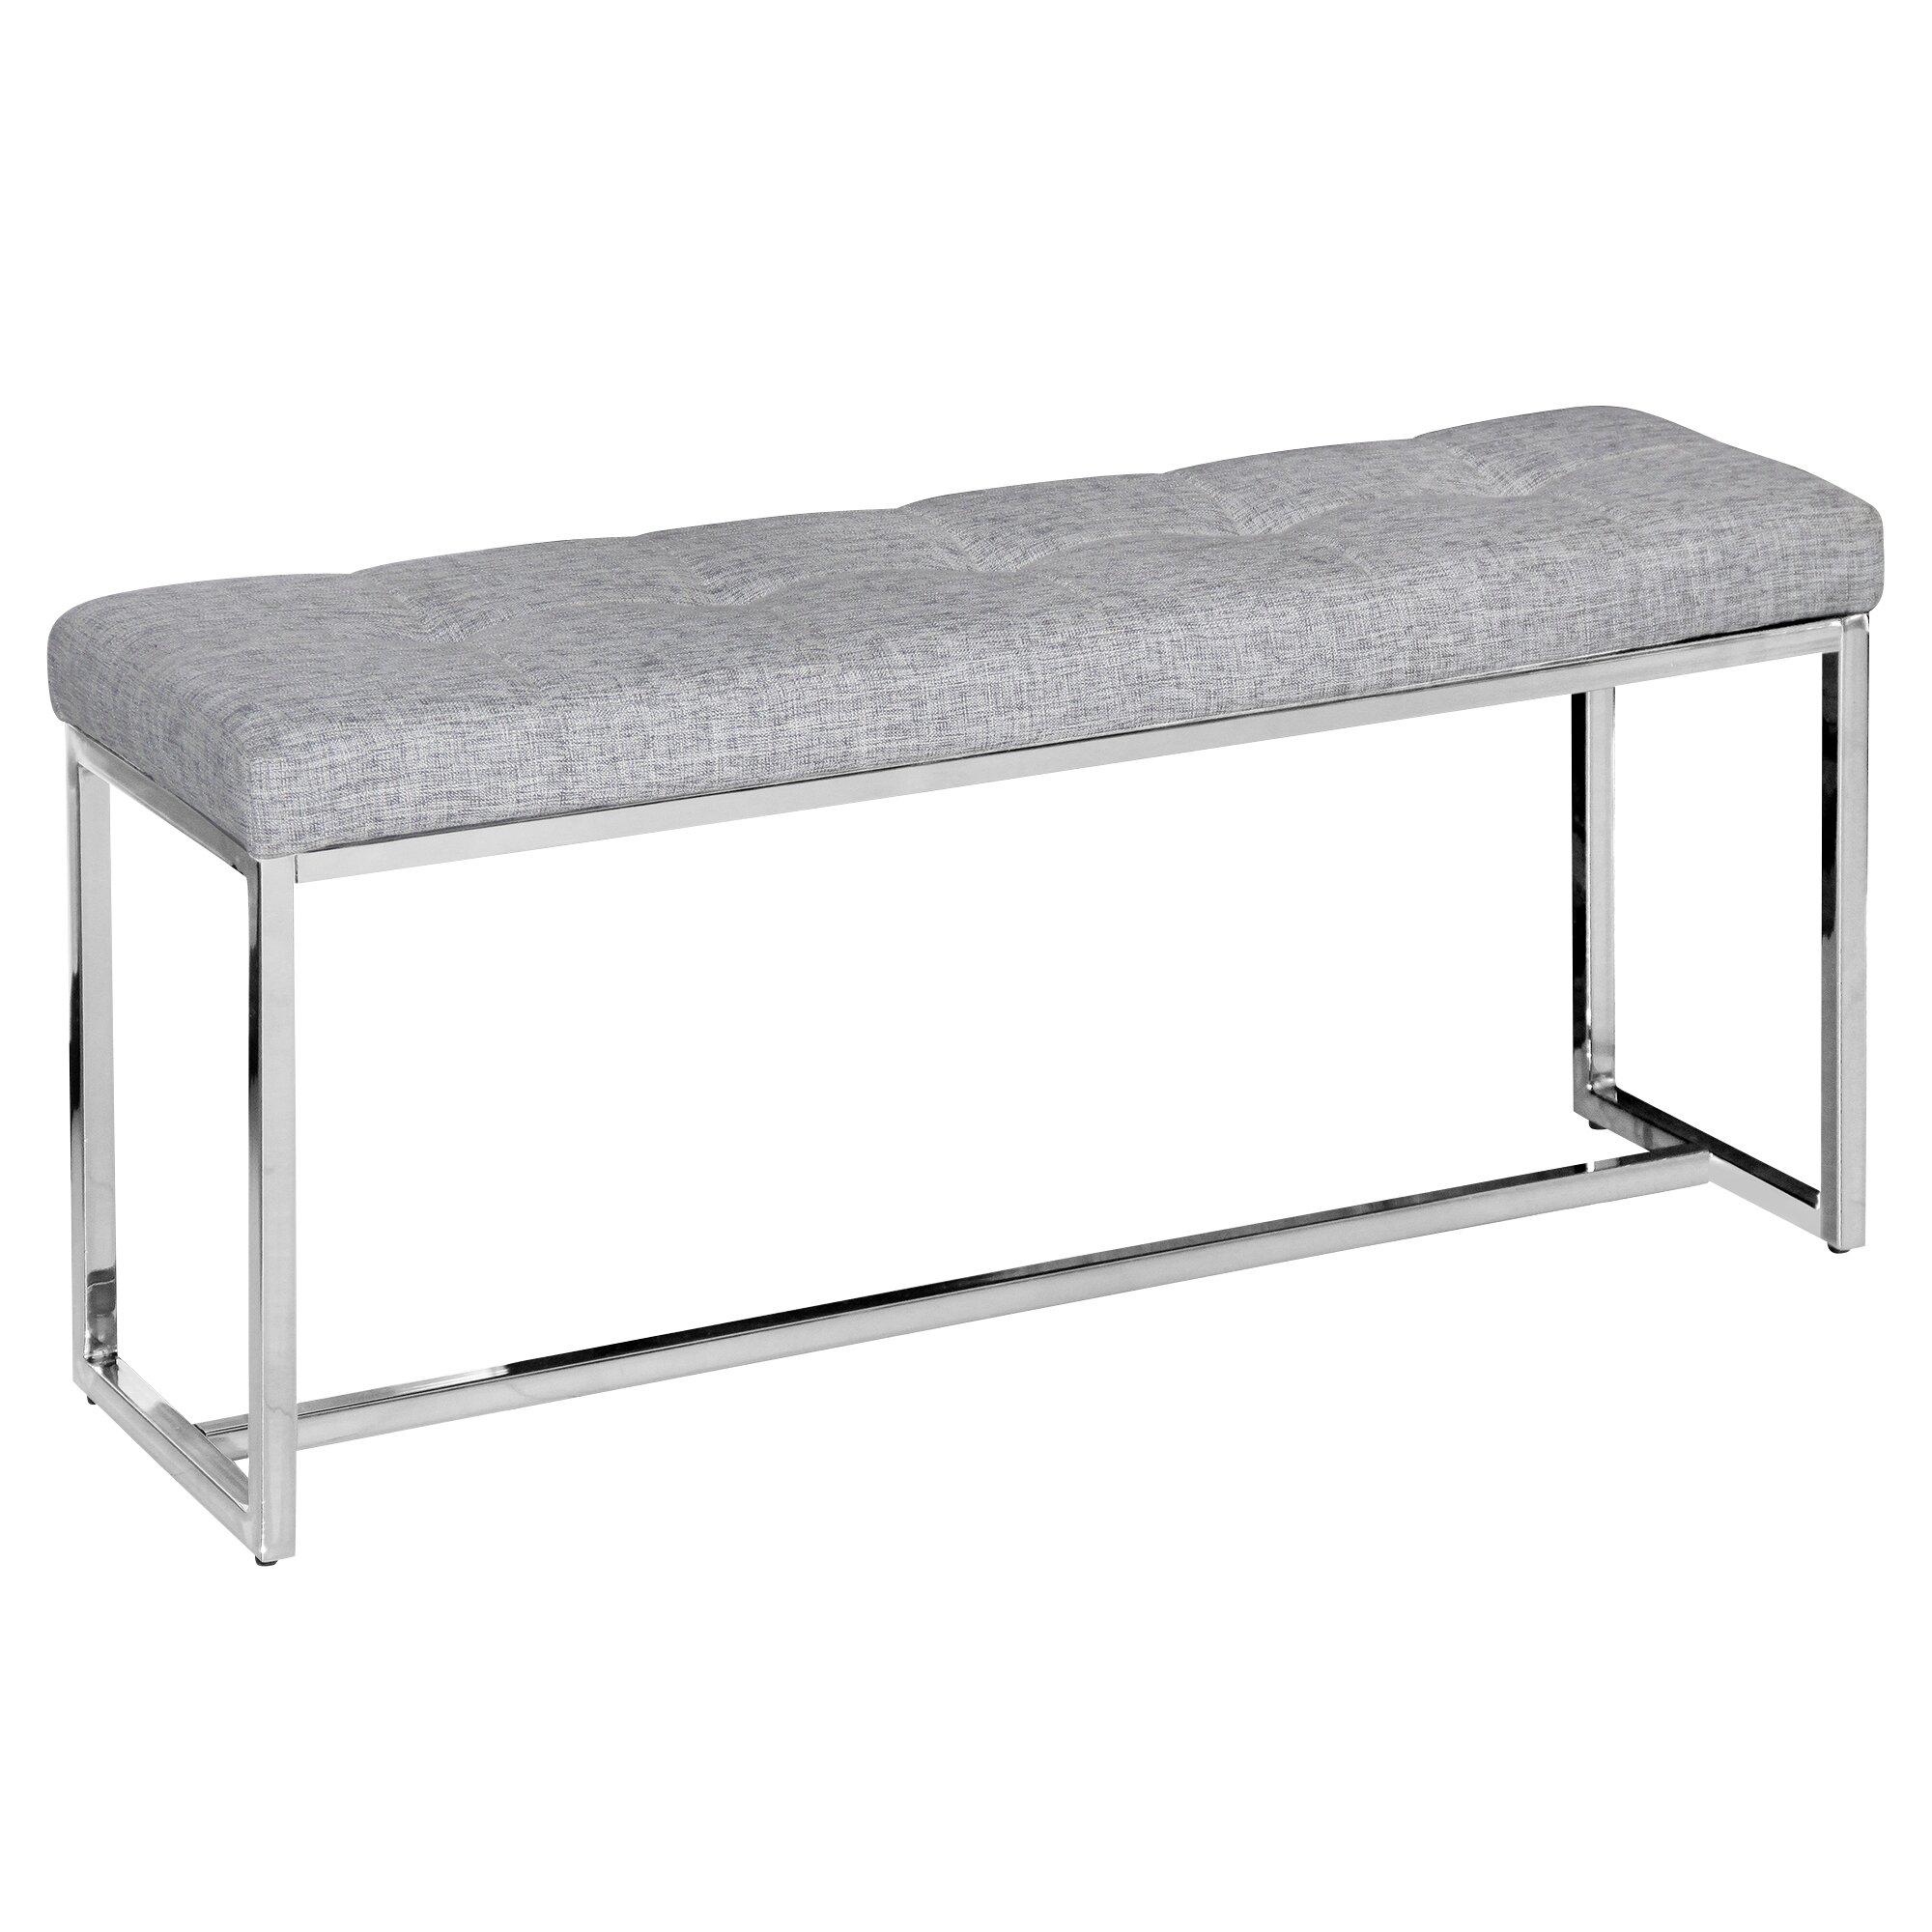 nspire Upholstered Bedroom Bench & Reviews